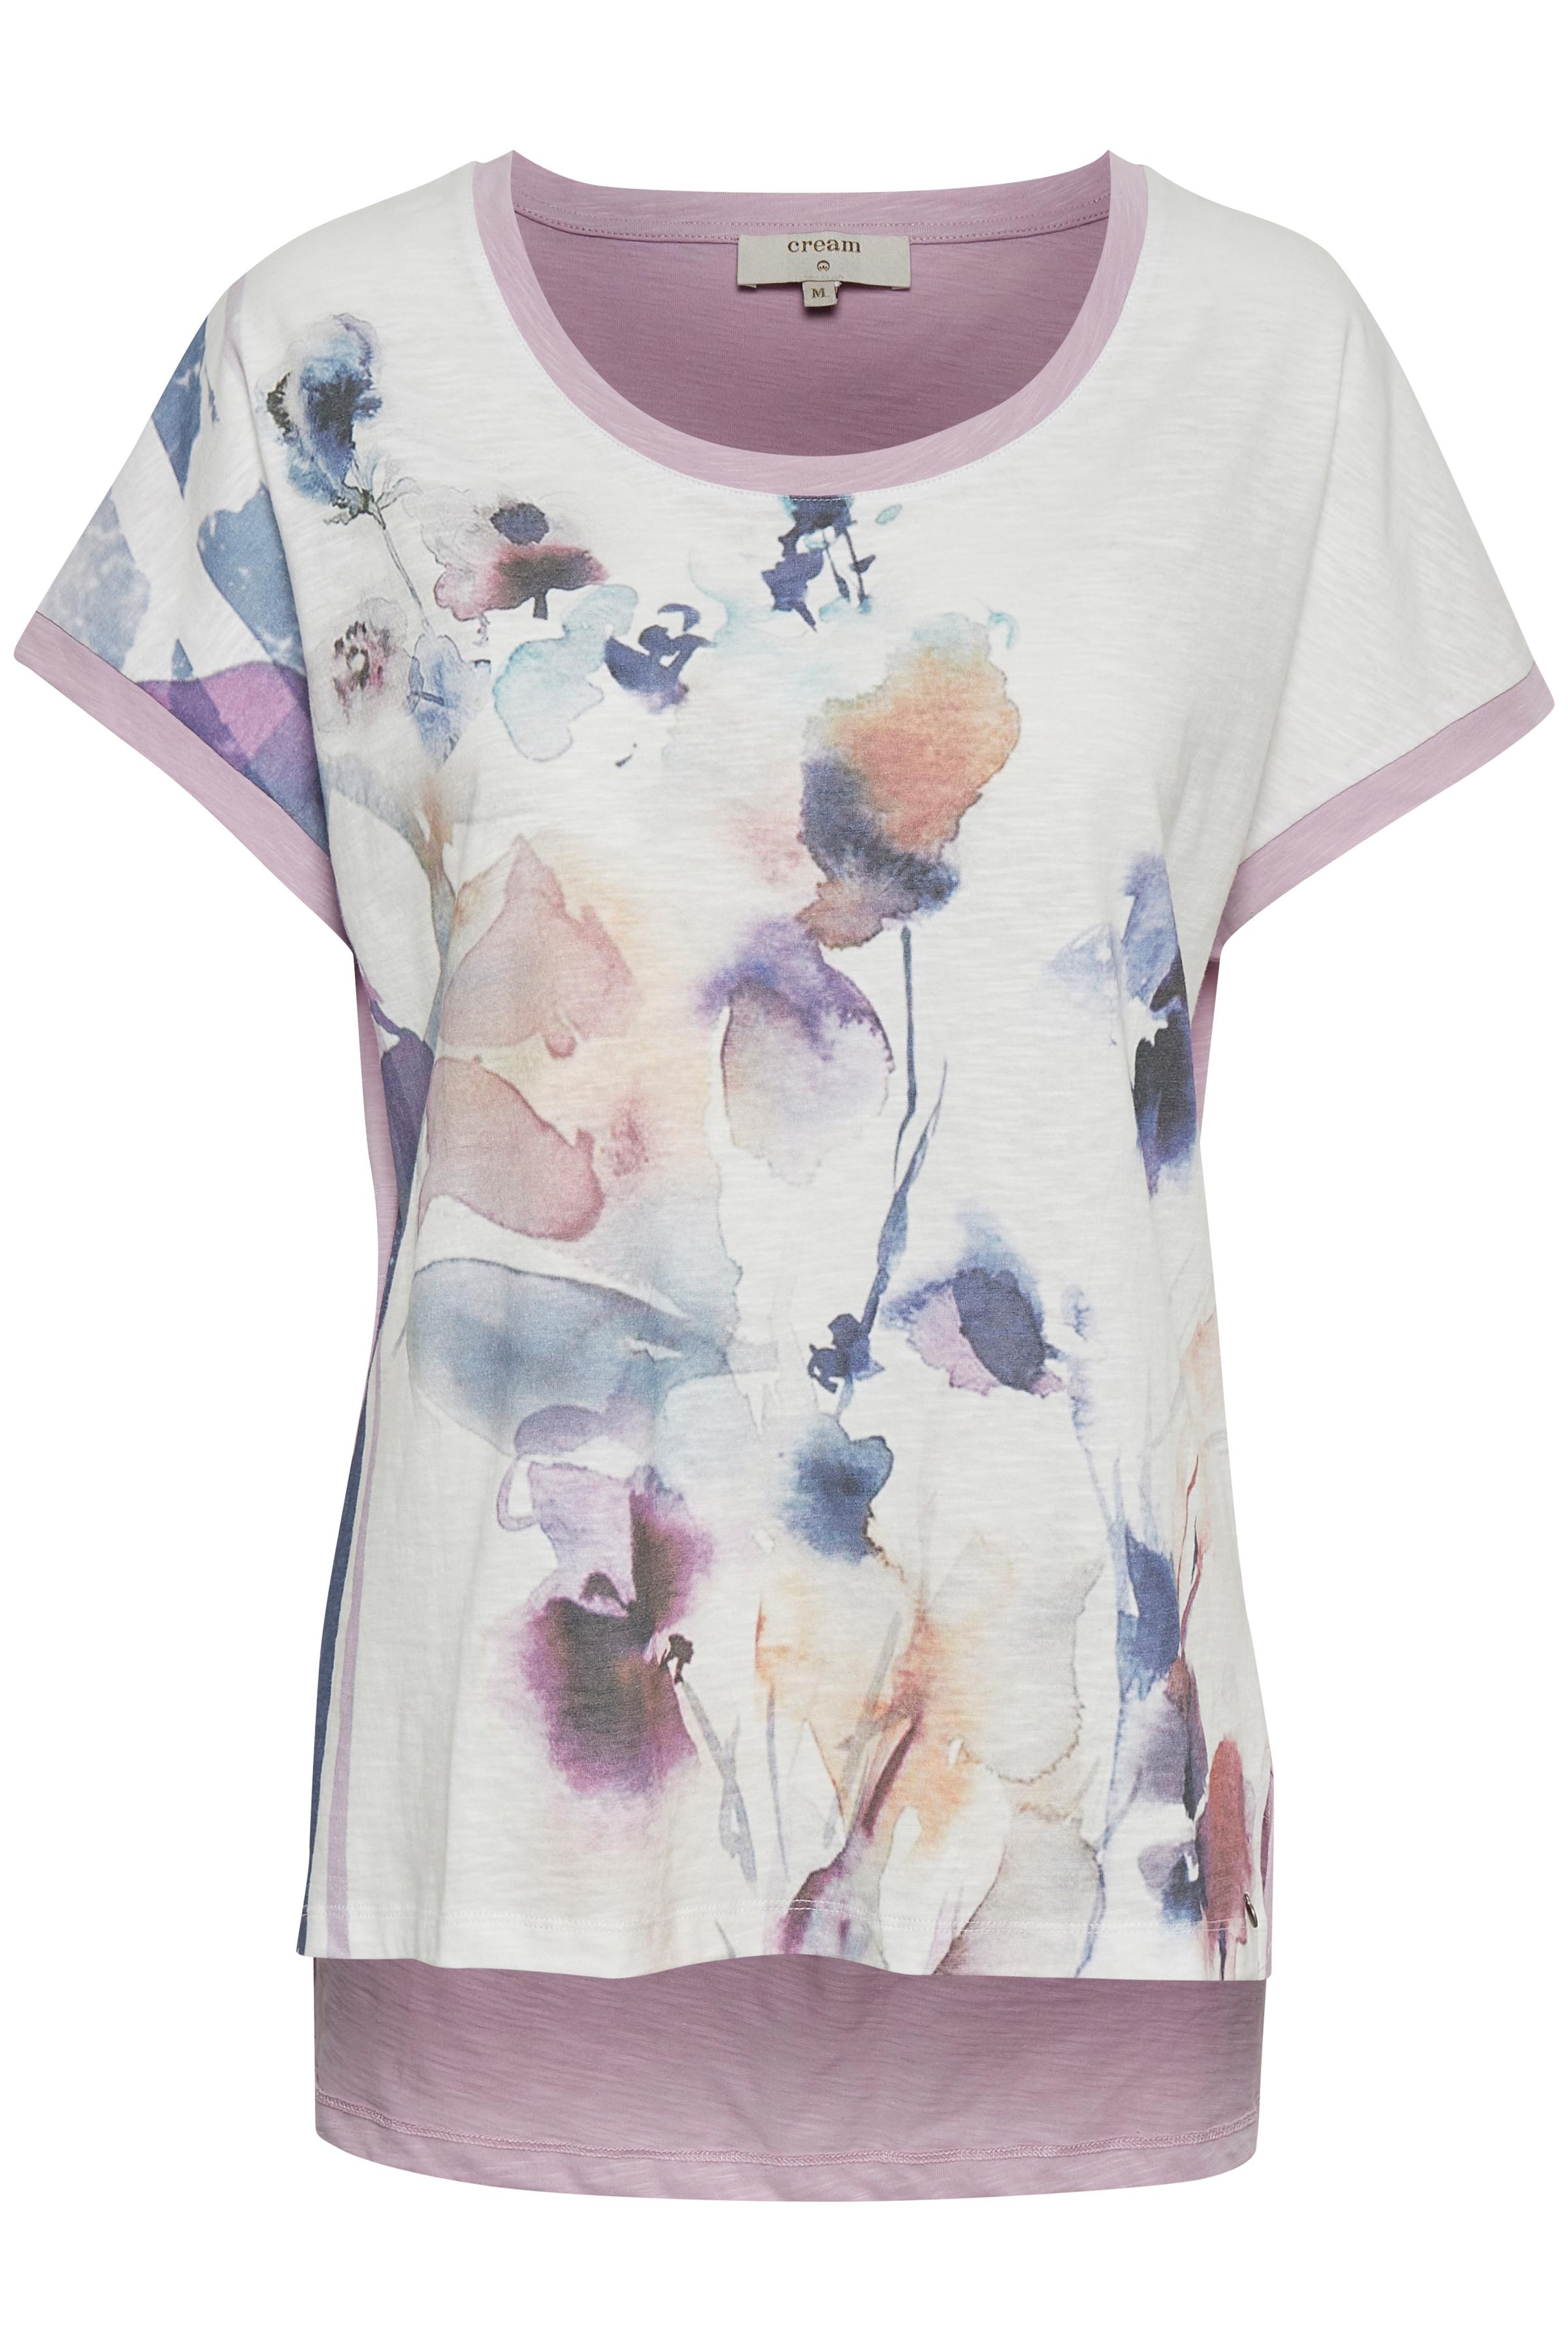 Off-white/lys lilla Kortærmet T-shirt fra Cream – Køb Off-white/lys lilla Kortærmet T-shirt fra str. XS-XXL her